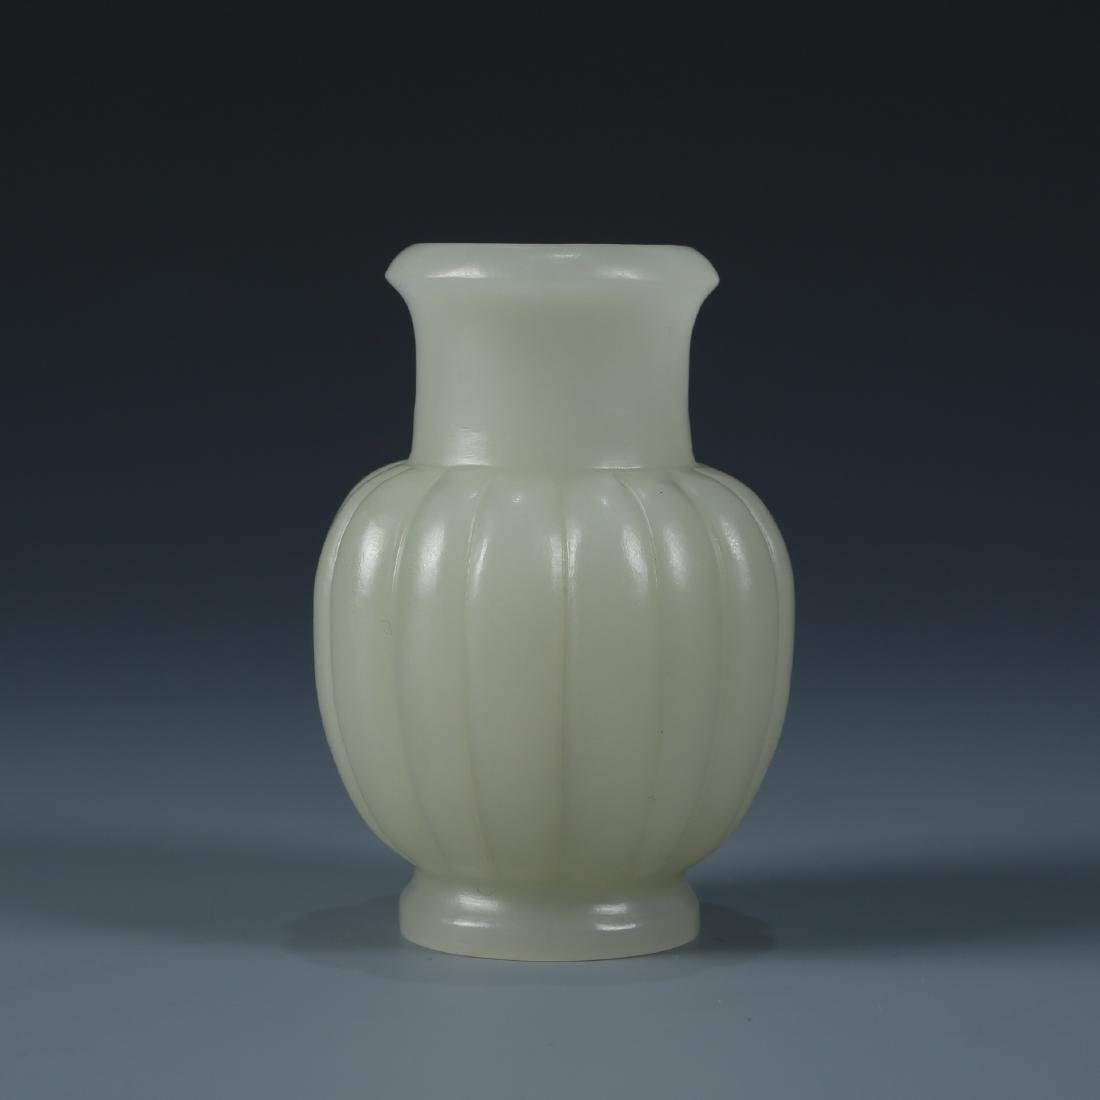 A White Jade Lobed Vase